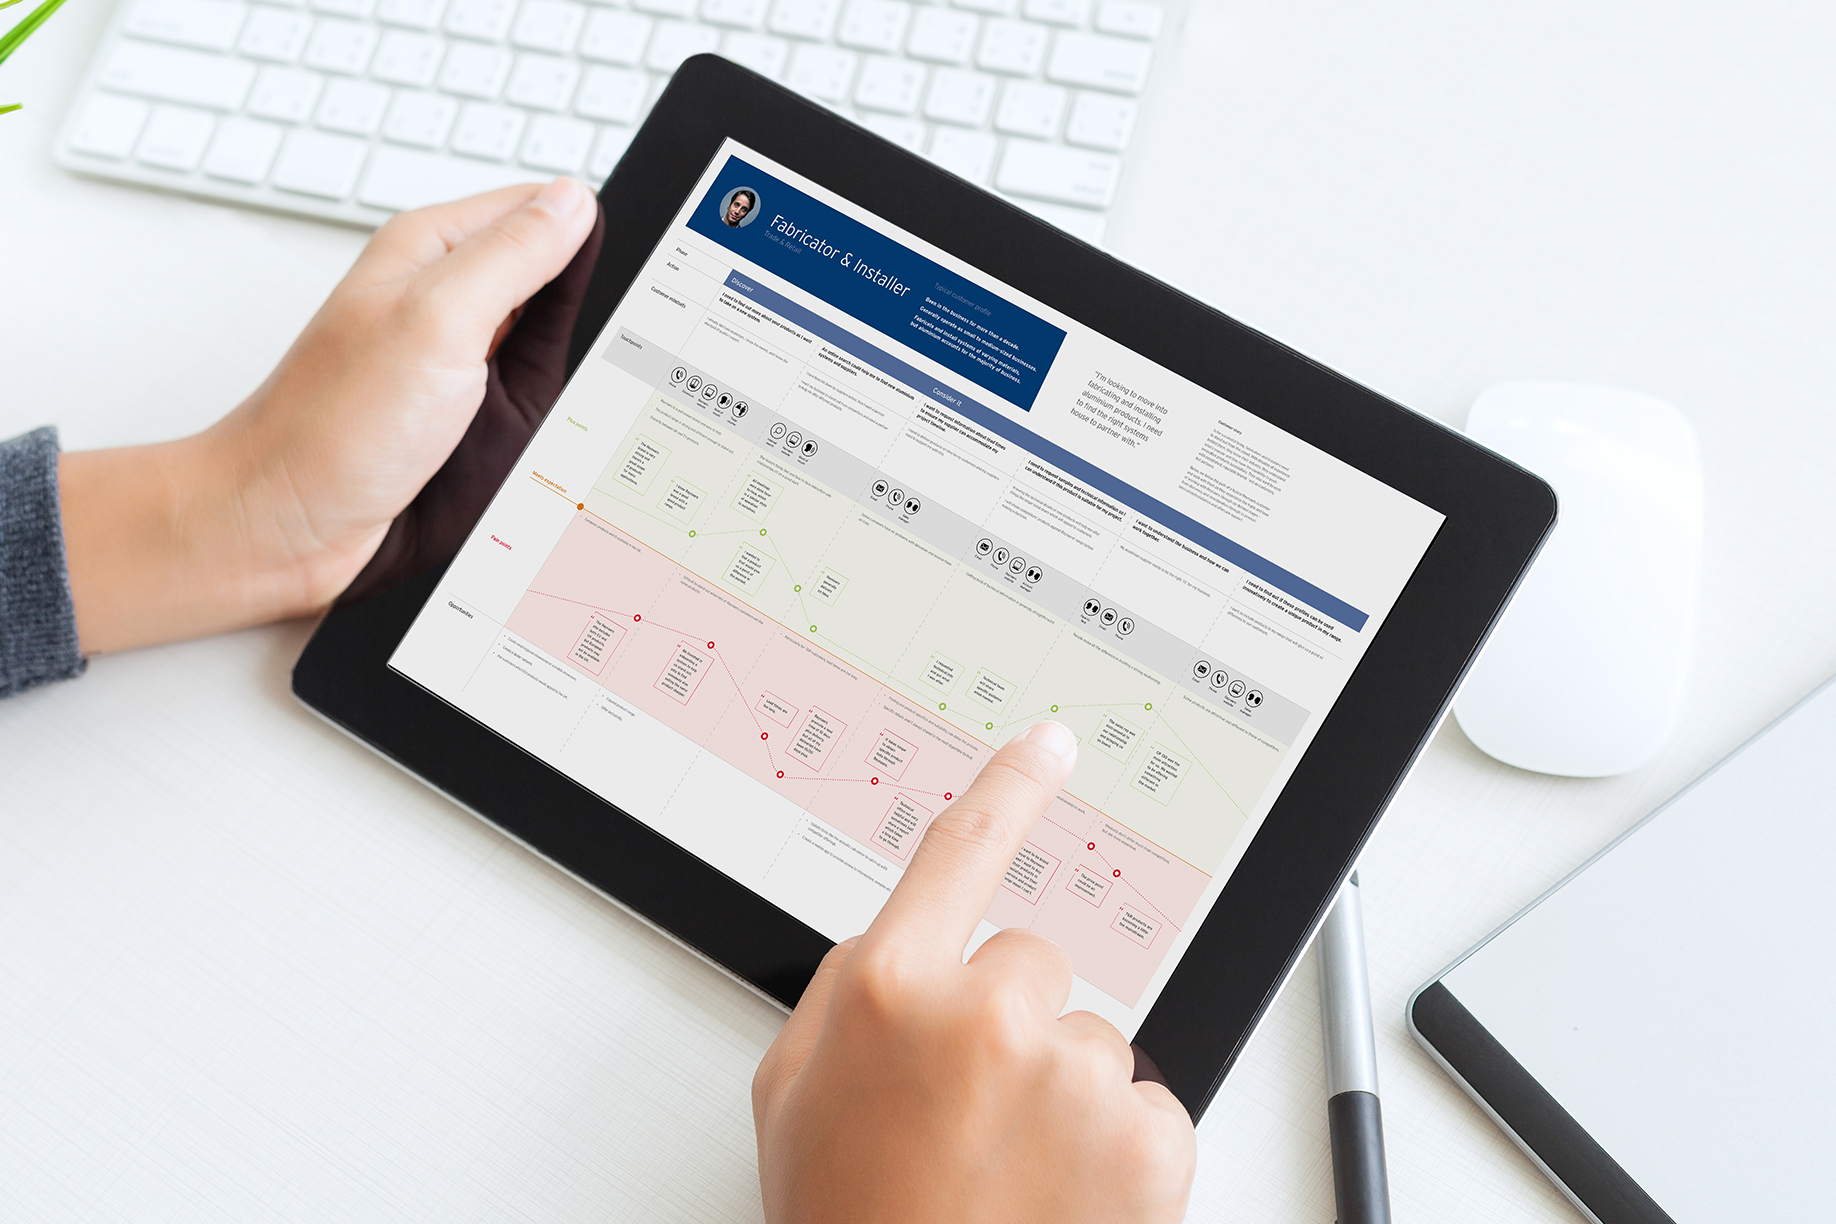 customer journey mapping on an ipad